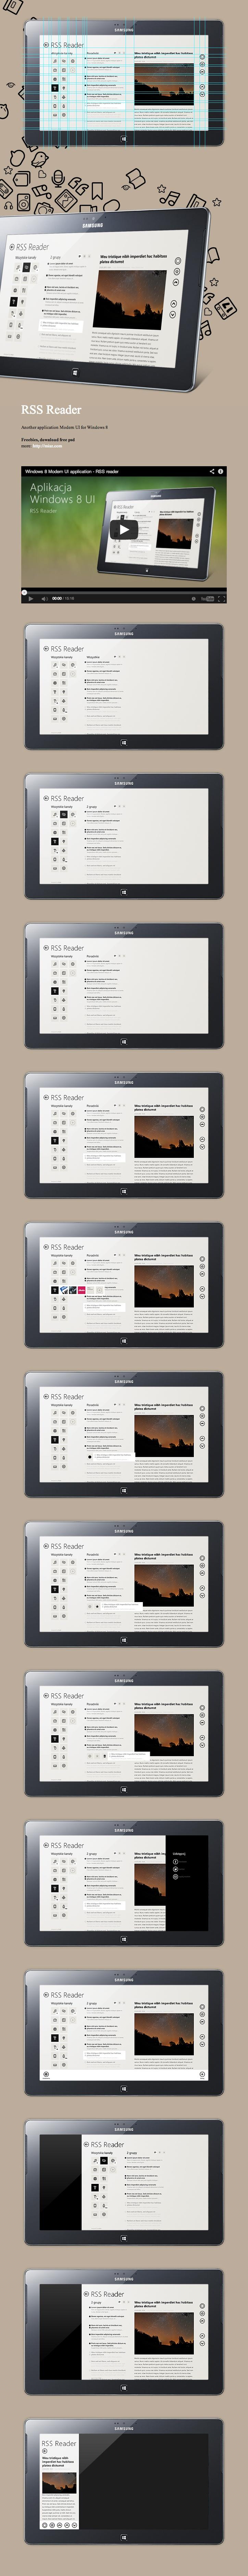 "RSS Reeder, Windows 8 UI mobile application by Michal Galubinski, via Behance *** Aplikacja pod Windows 8 Modern UI, ""RSS Reader"" – mobile application design."